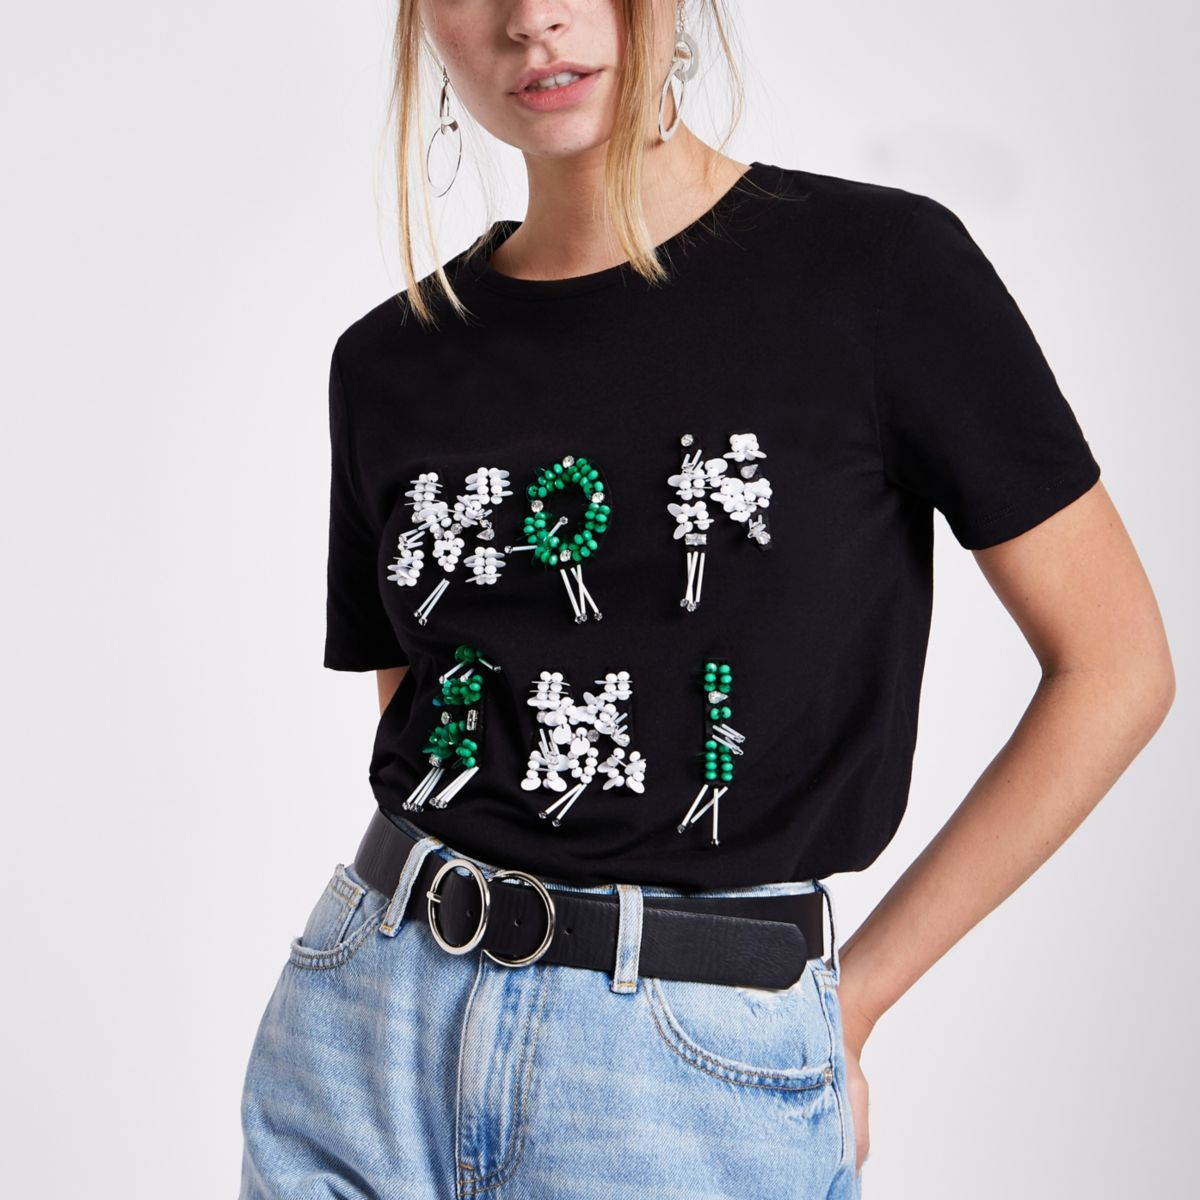 petite black mon ami sequin t shirt tops sale women. Black Bedroom Furniture Sets. Home Design Ideas